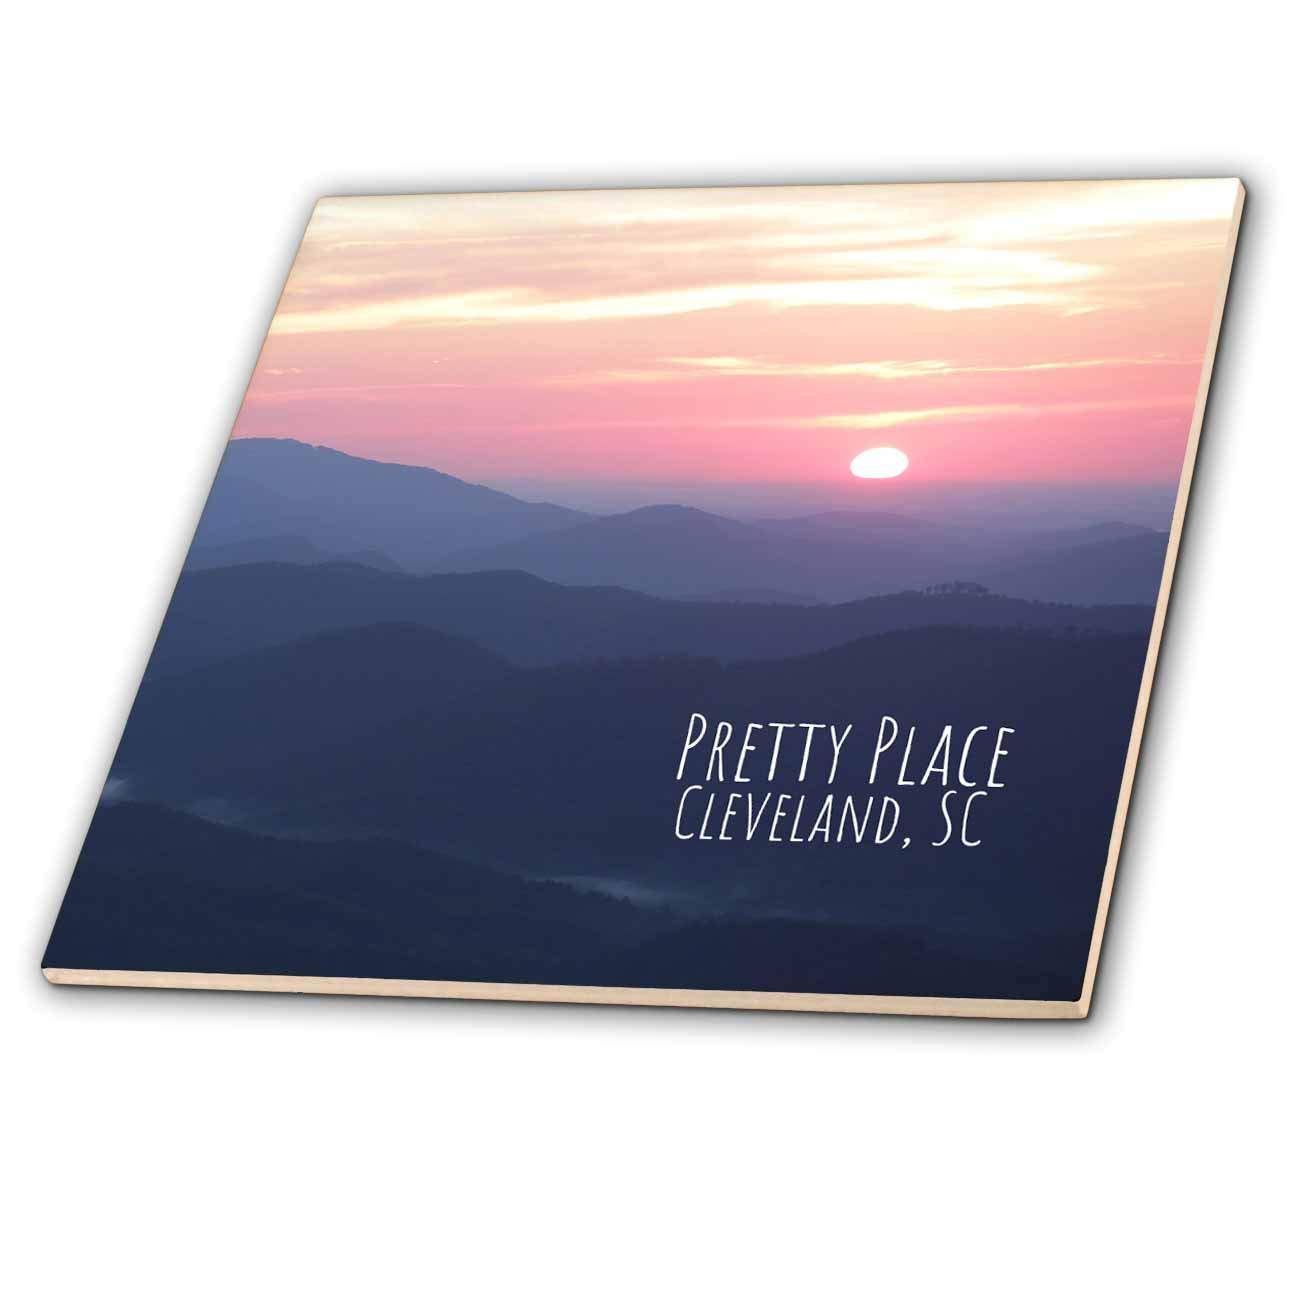 Cleveland Typography South Carolina - T-Shirts 3dRose Stamp City Breathtaking Sunrise at Pretty Place